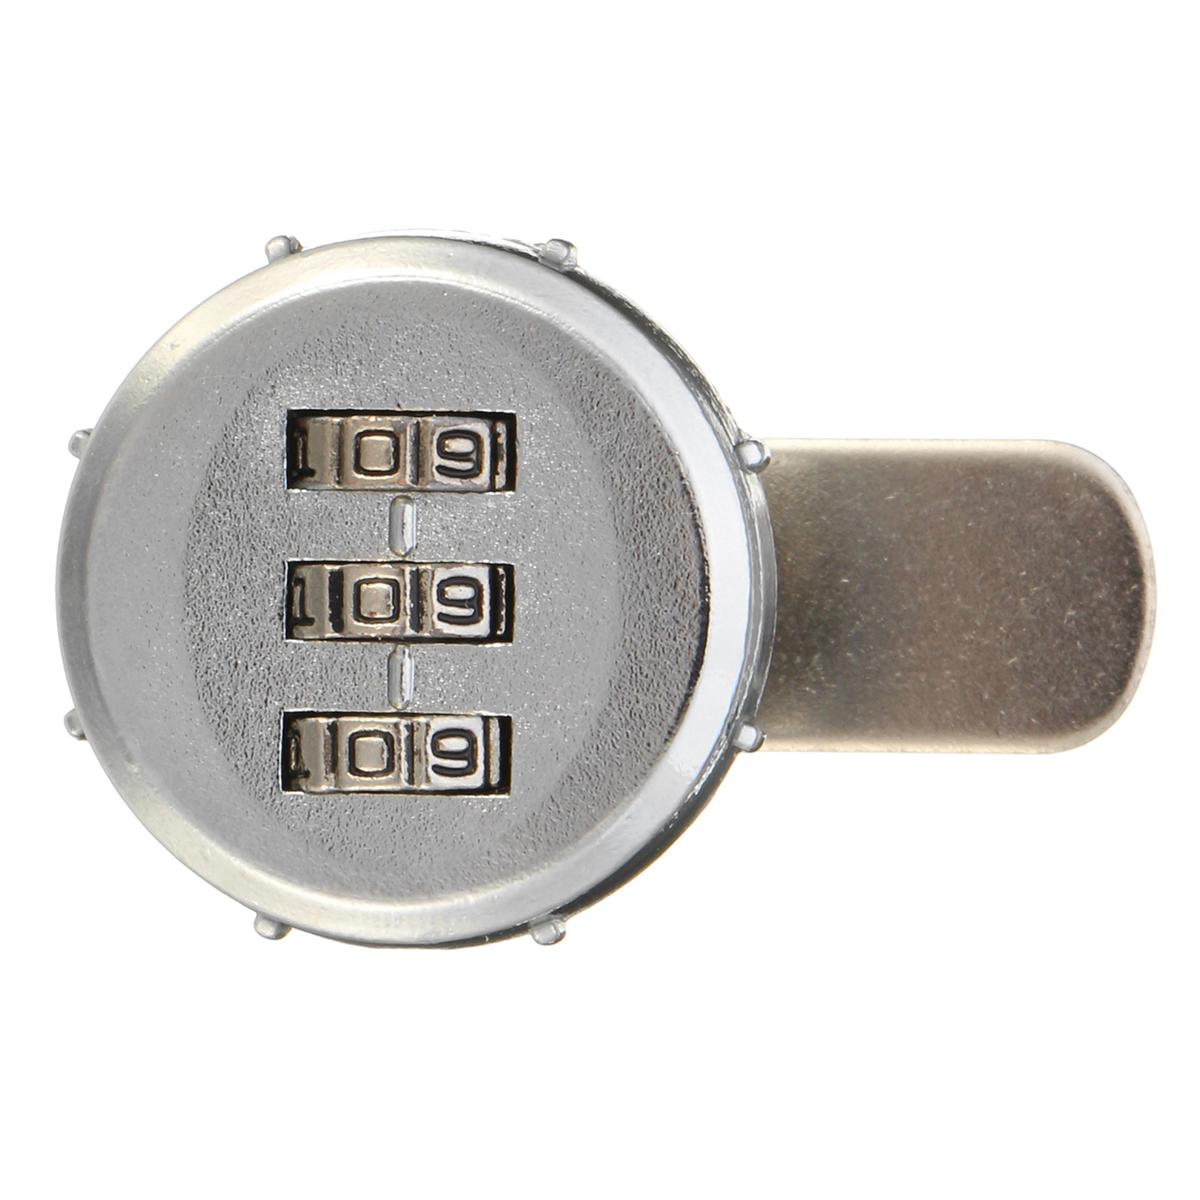 20//25//30mm Digital Briefkastenschloß Schrankschloß Zahlenschloss Möbelschloß (